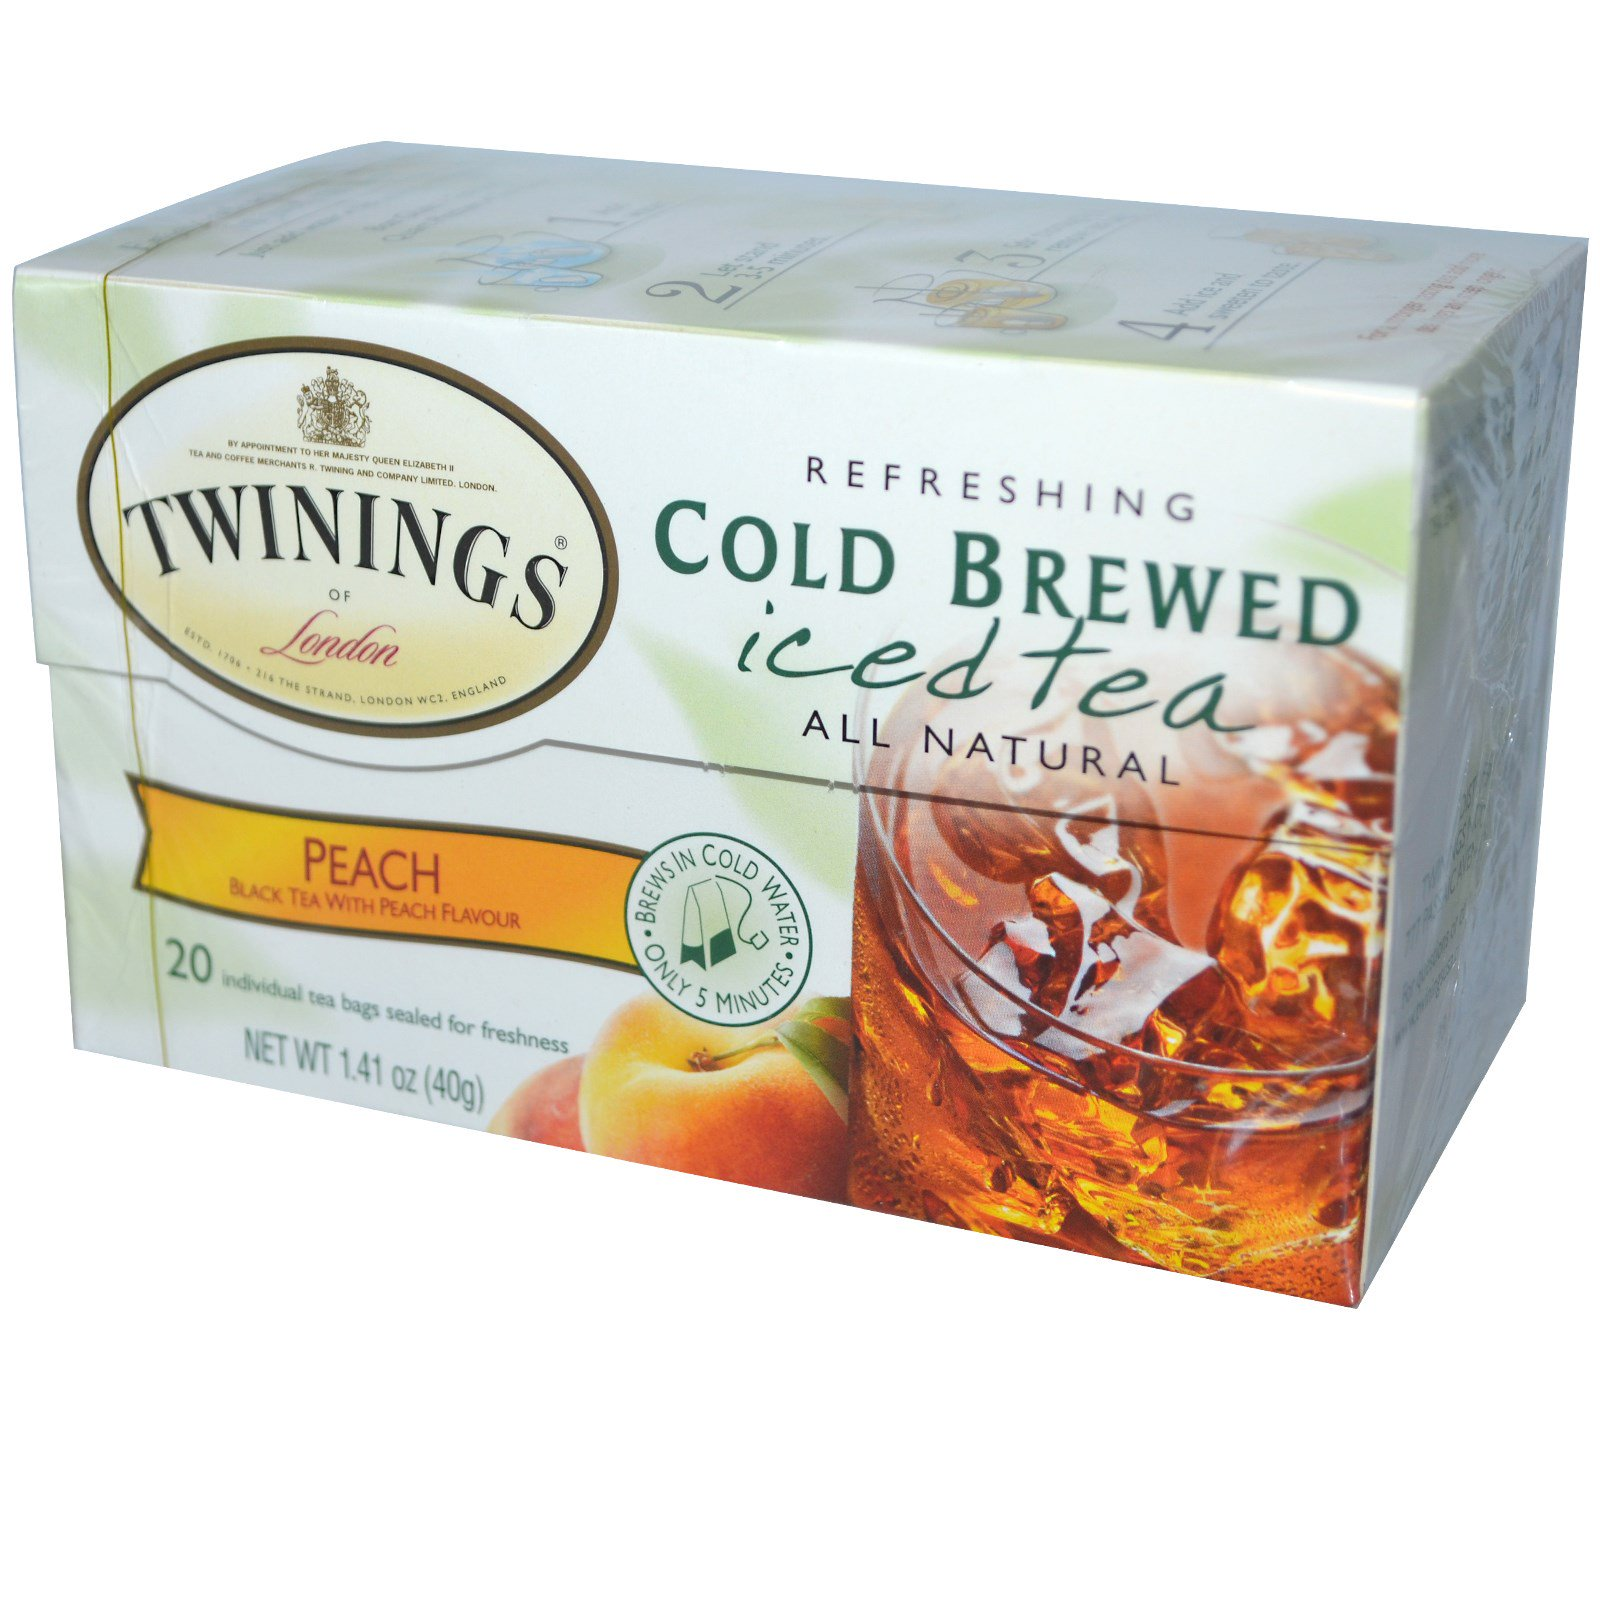 Twinings Cold Brewed Iced Tea Peach 20 Bags 1 41 Oz